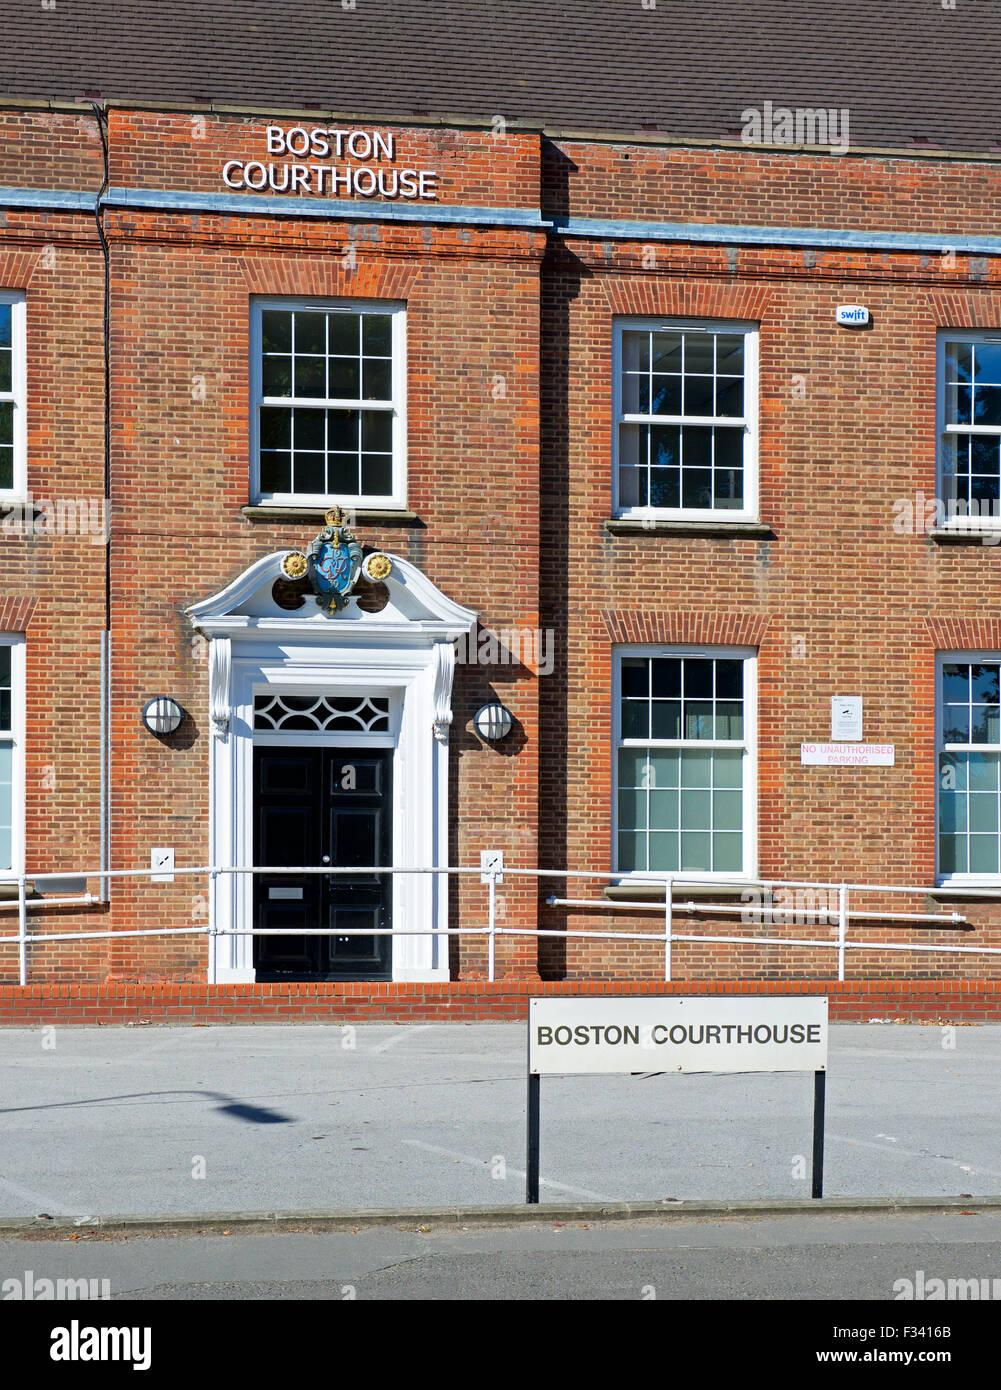 El Courthouse, Boston, Lincolnshire, Inglaterra Imagen De Stock